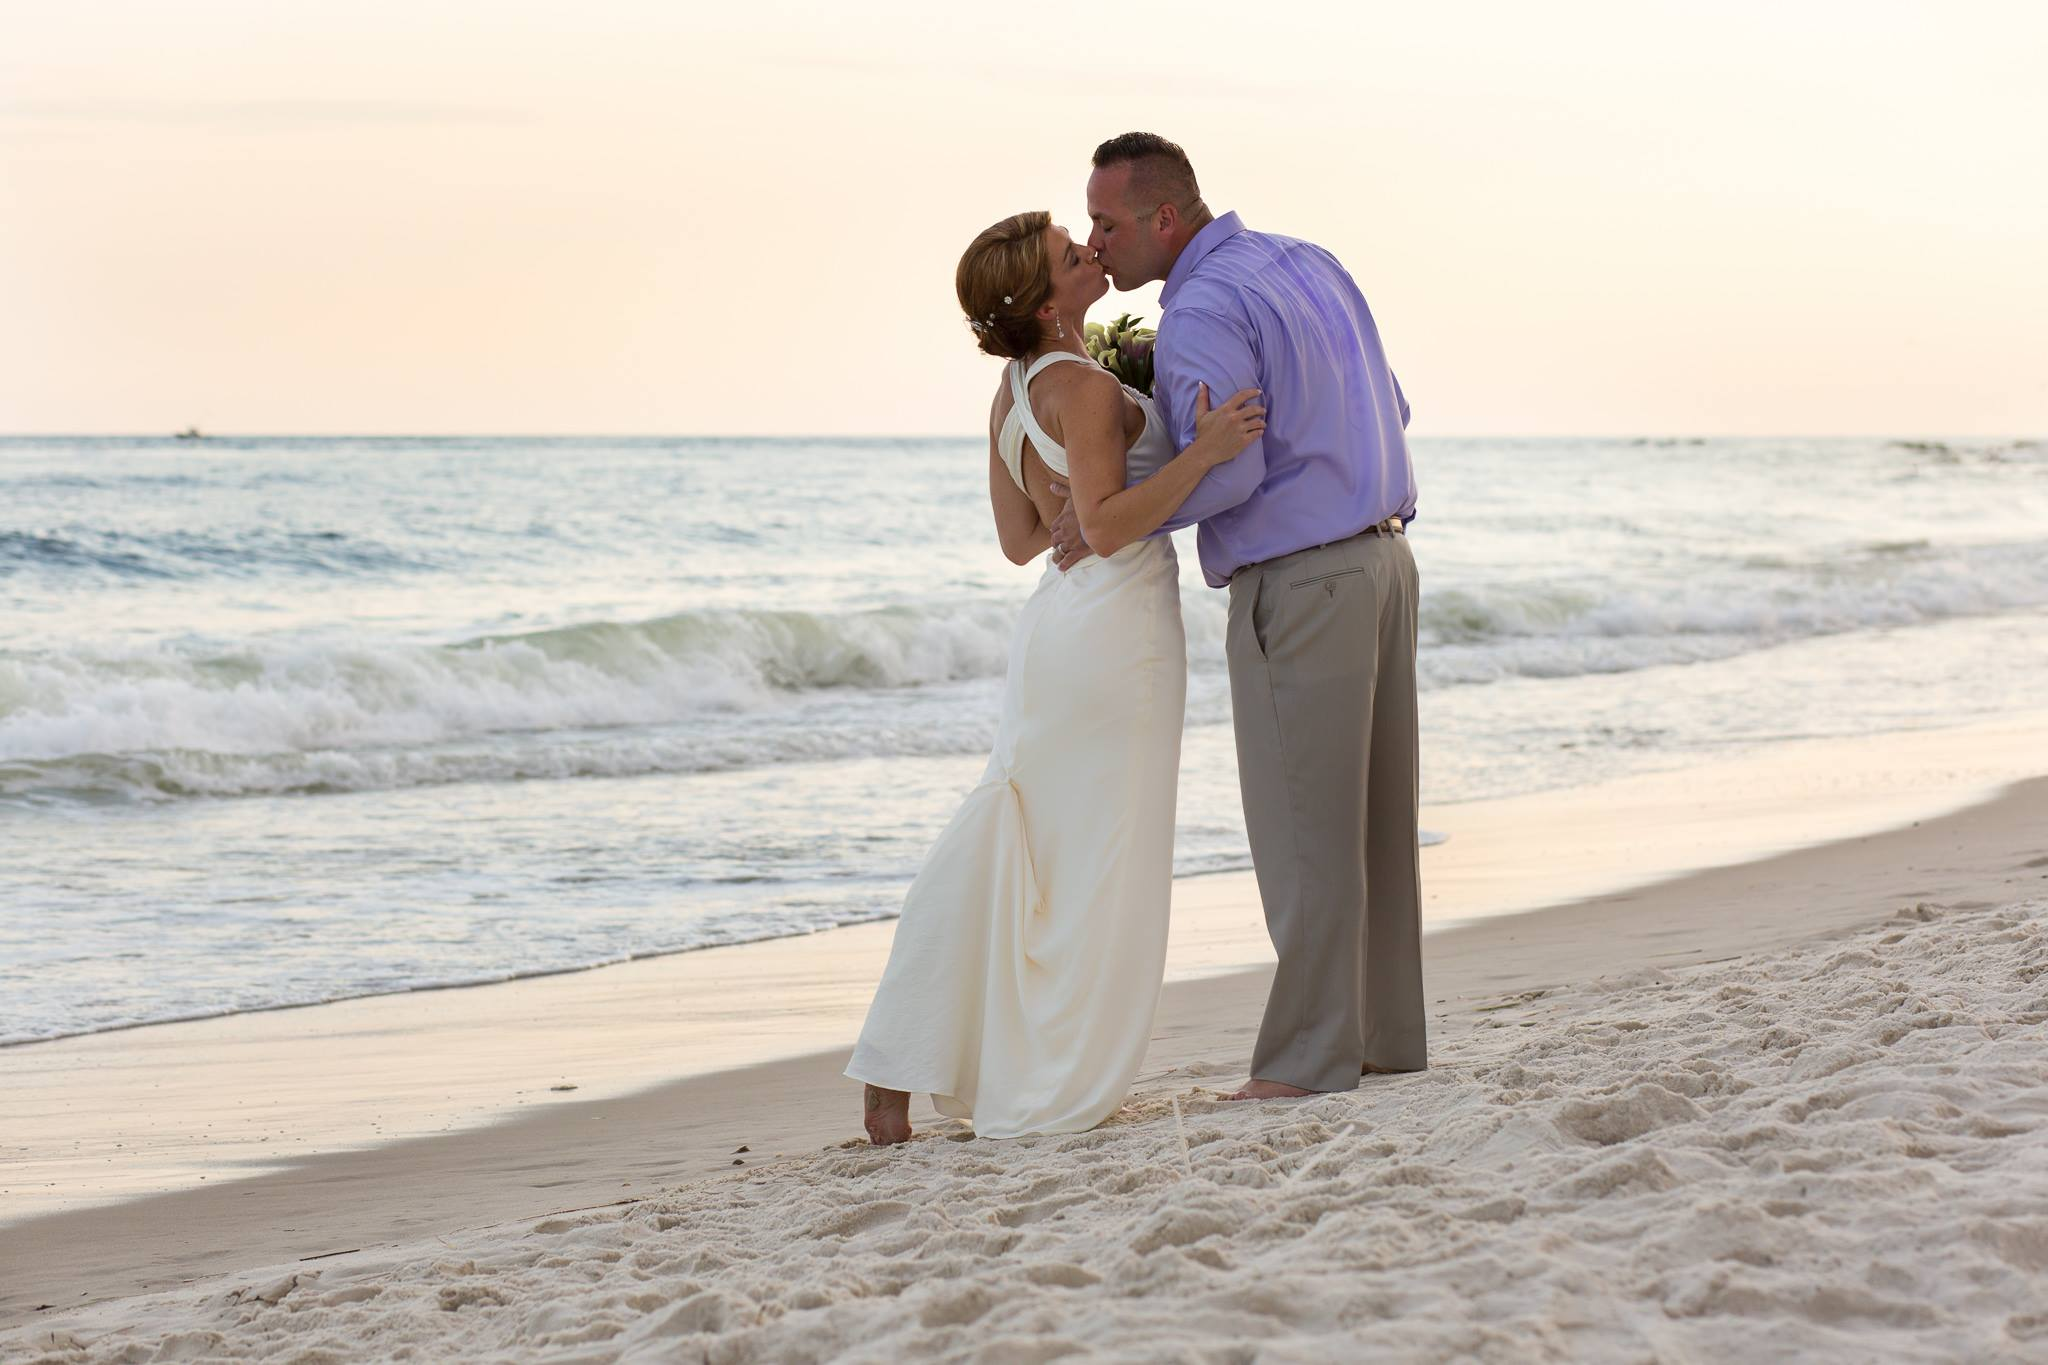 Orange Beach Photographer Weddings at the beach in Alabama